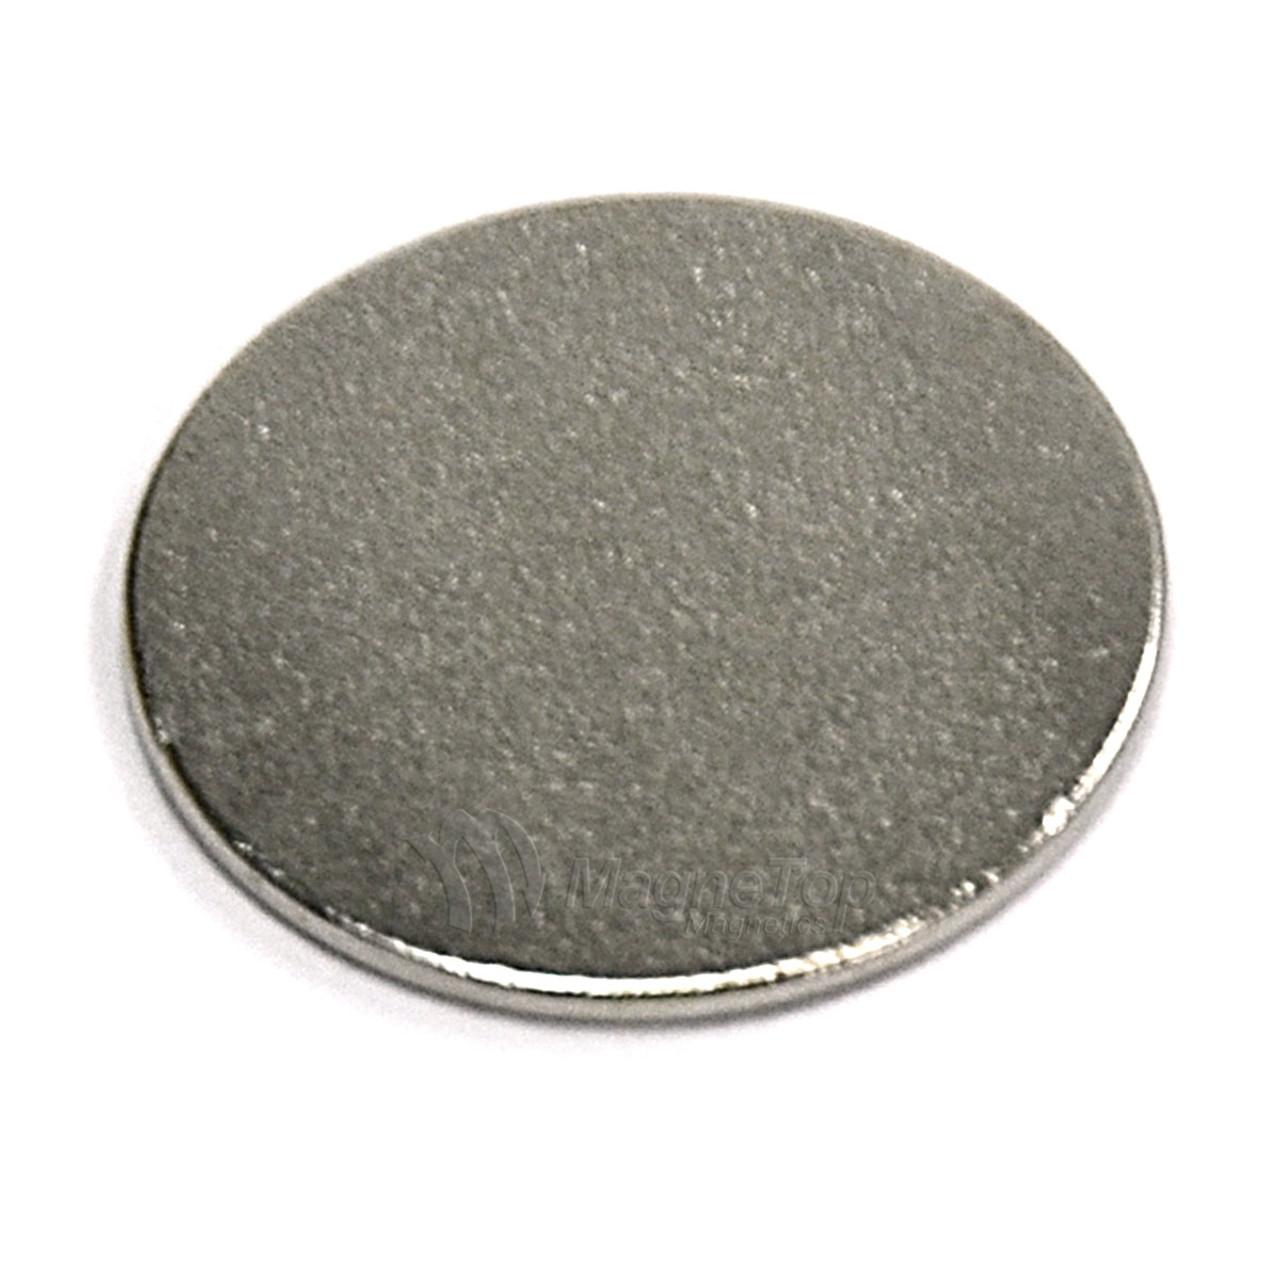 Neodymium Disk  -  15mm x 1mm - N35